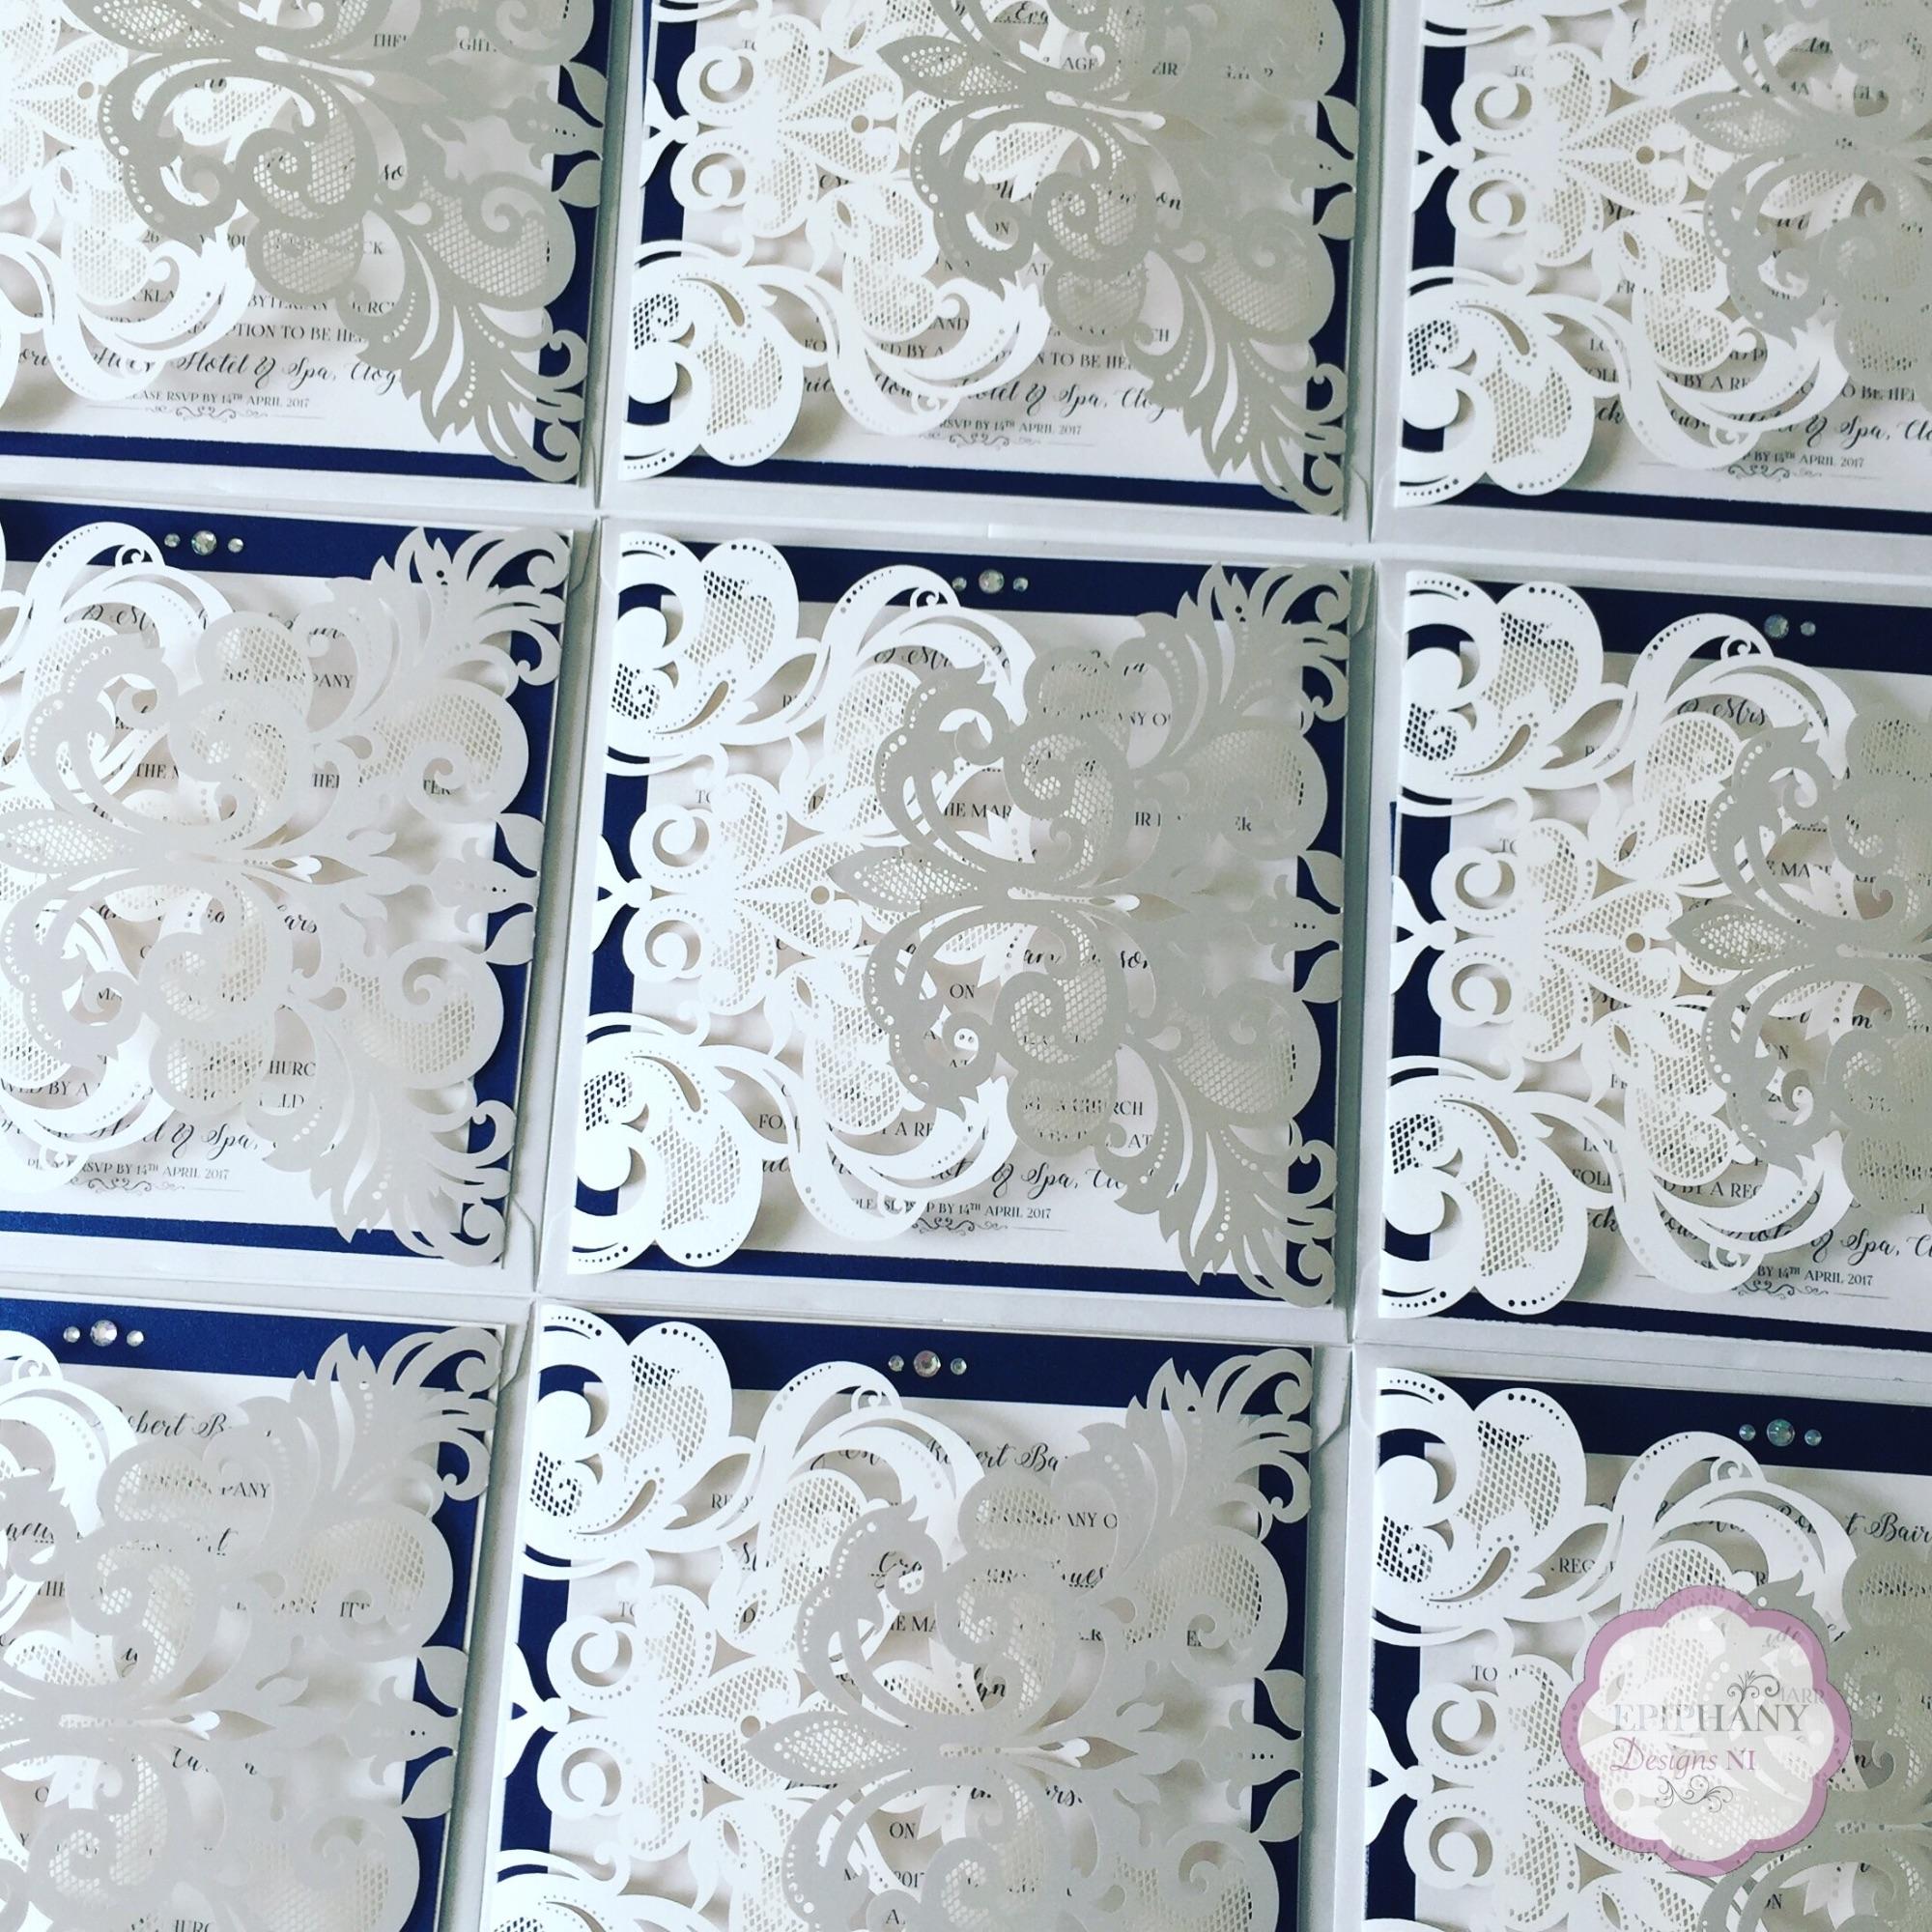 Lace Lasercut Gatefold invitation navy shimmer backing card